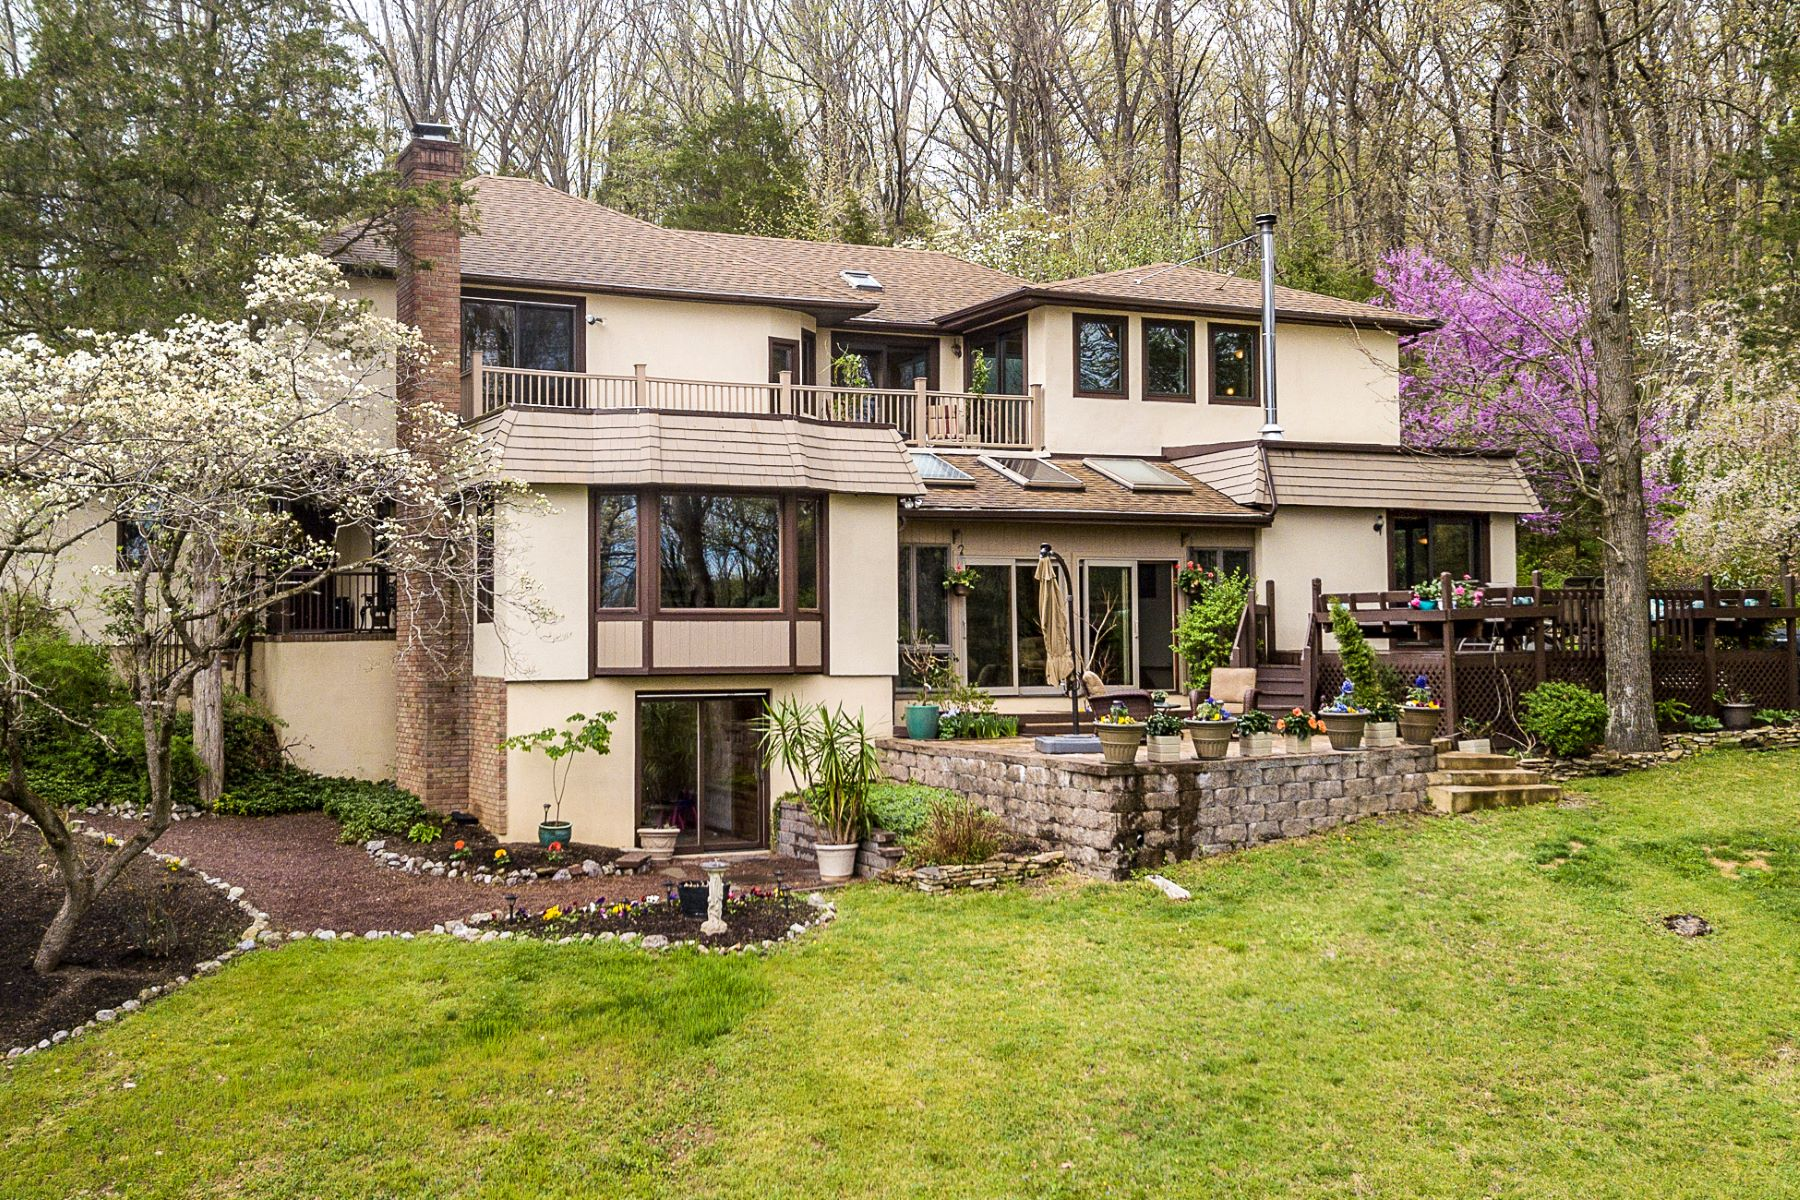 single family homes için Satış at Make Lasting Memories In This Wonderful Home! 430 Riegelsville Road, Milford, New Jersey 08848 Amerika Birleşik Devletleri